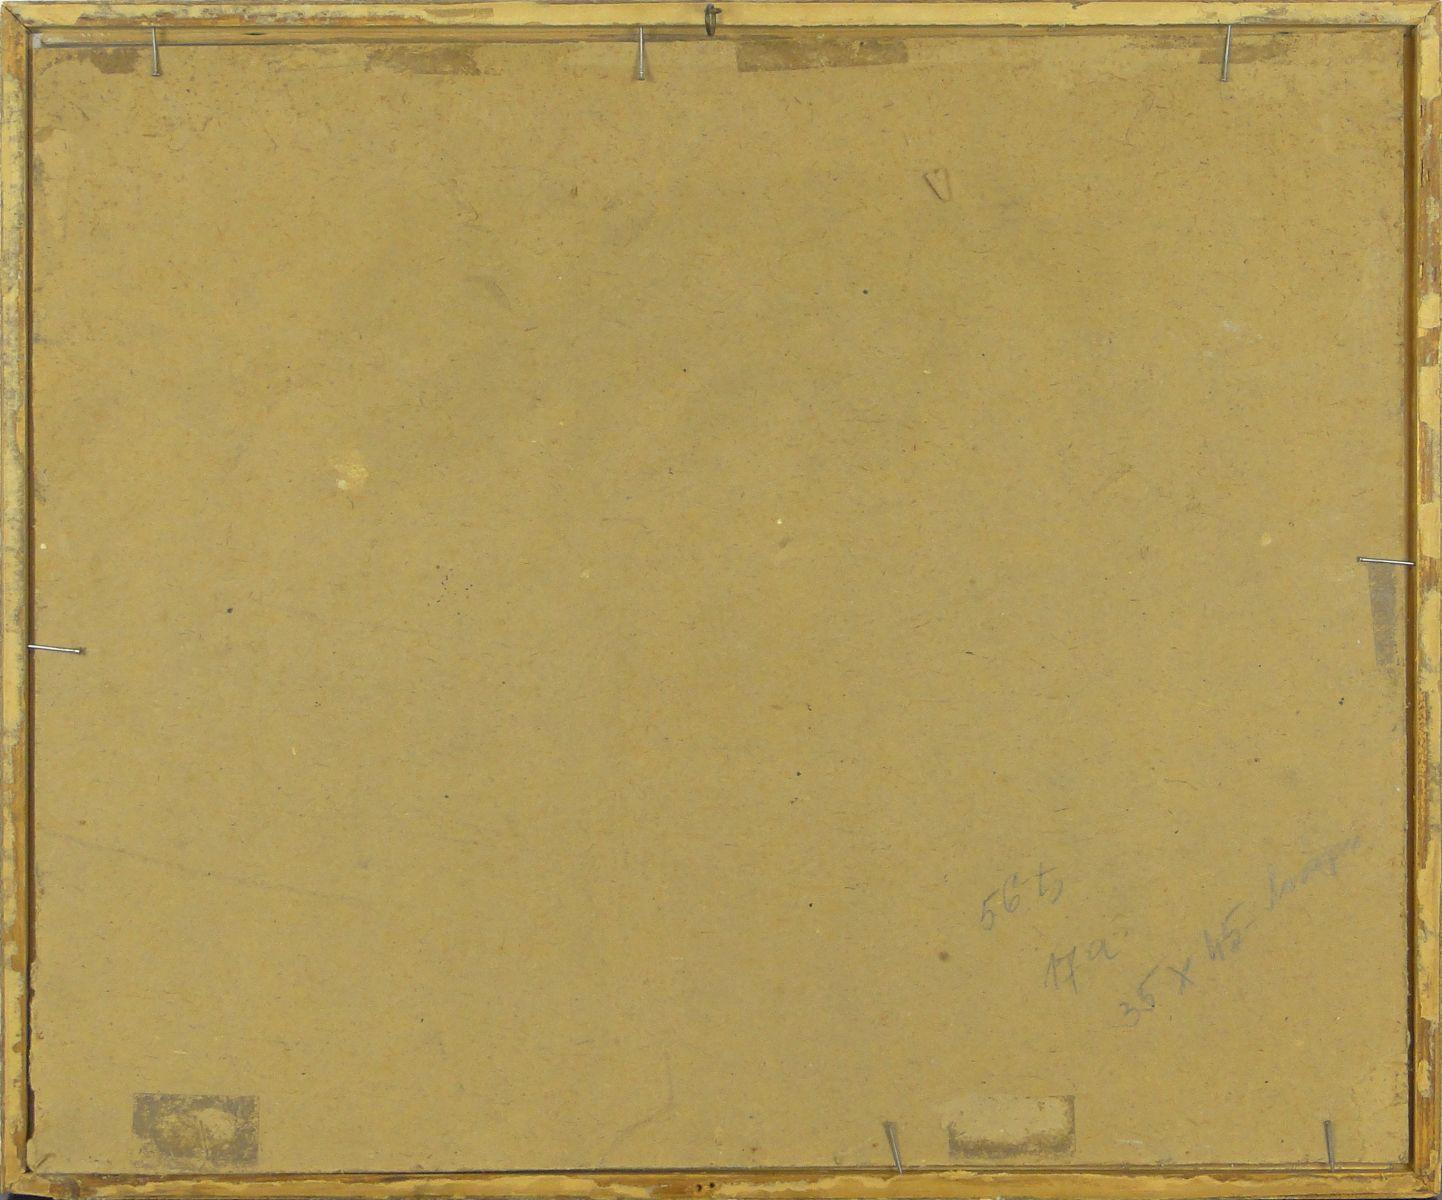 DSC02687.JPG (1442�1200)